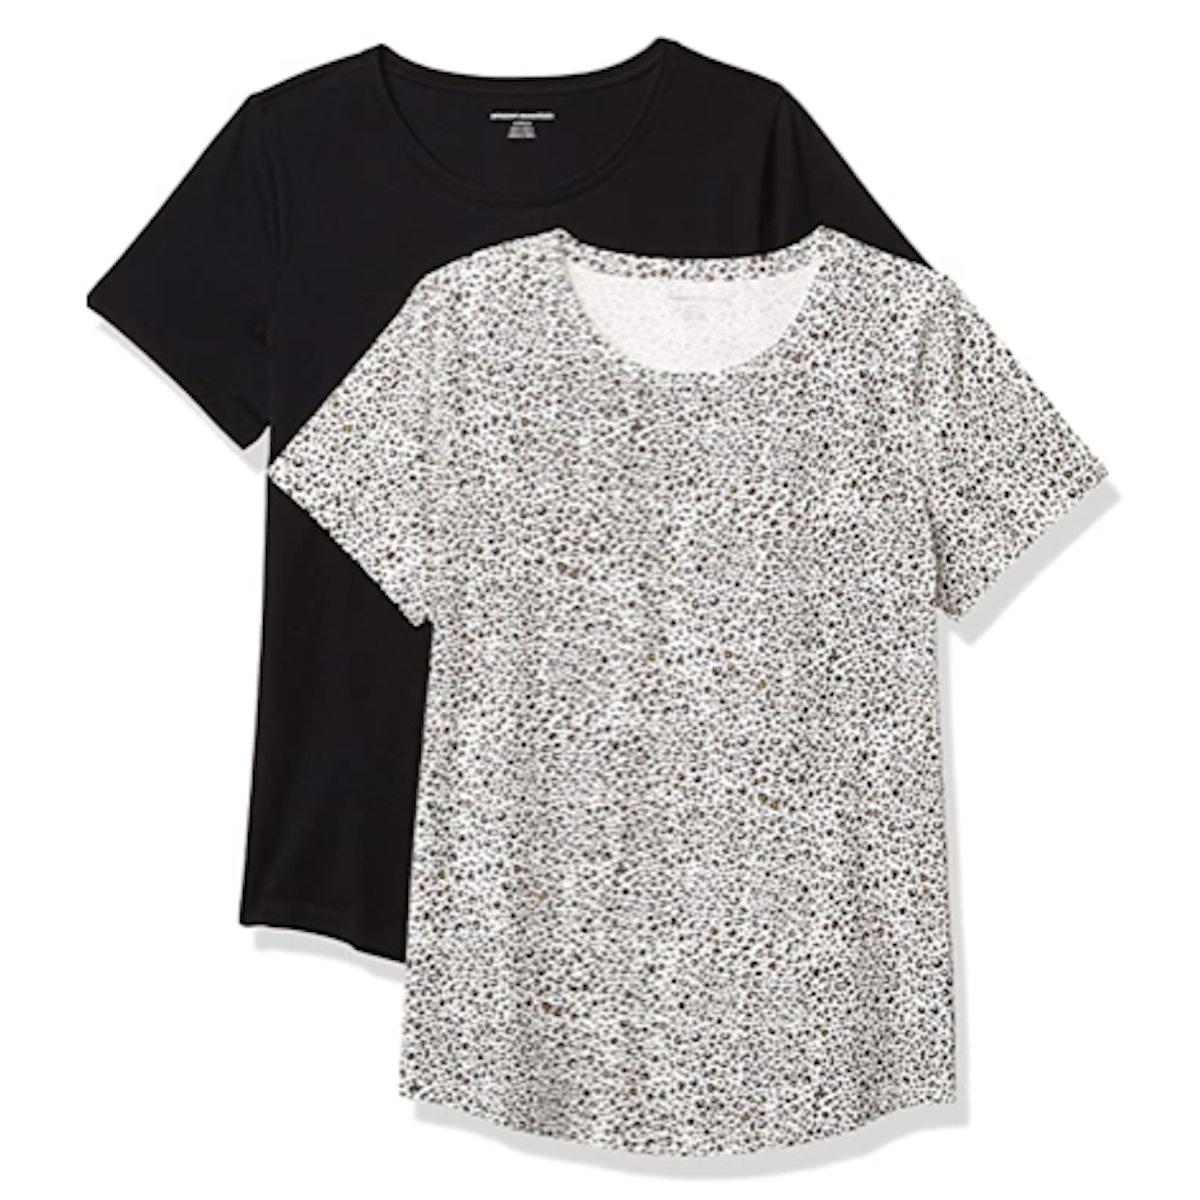 Amazon Essentials Cotton T-Shirts (2-Pack)